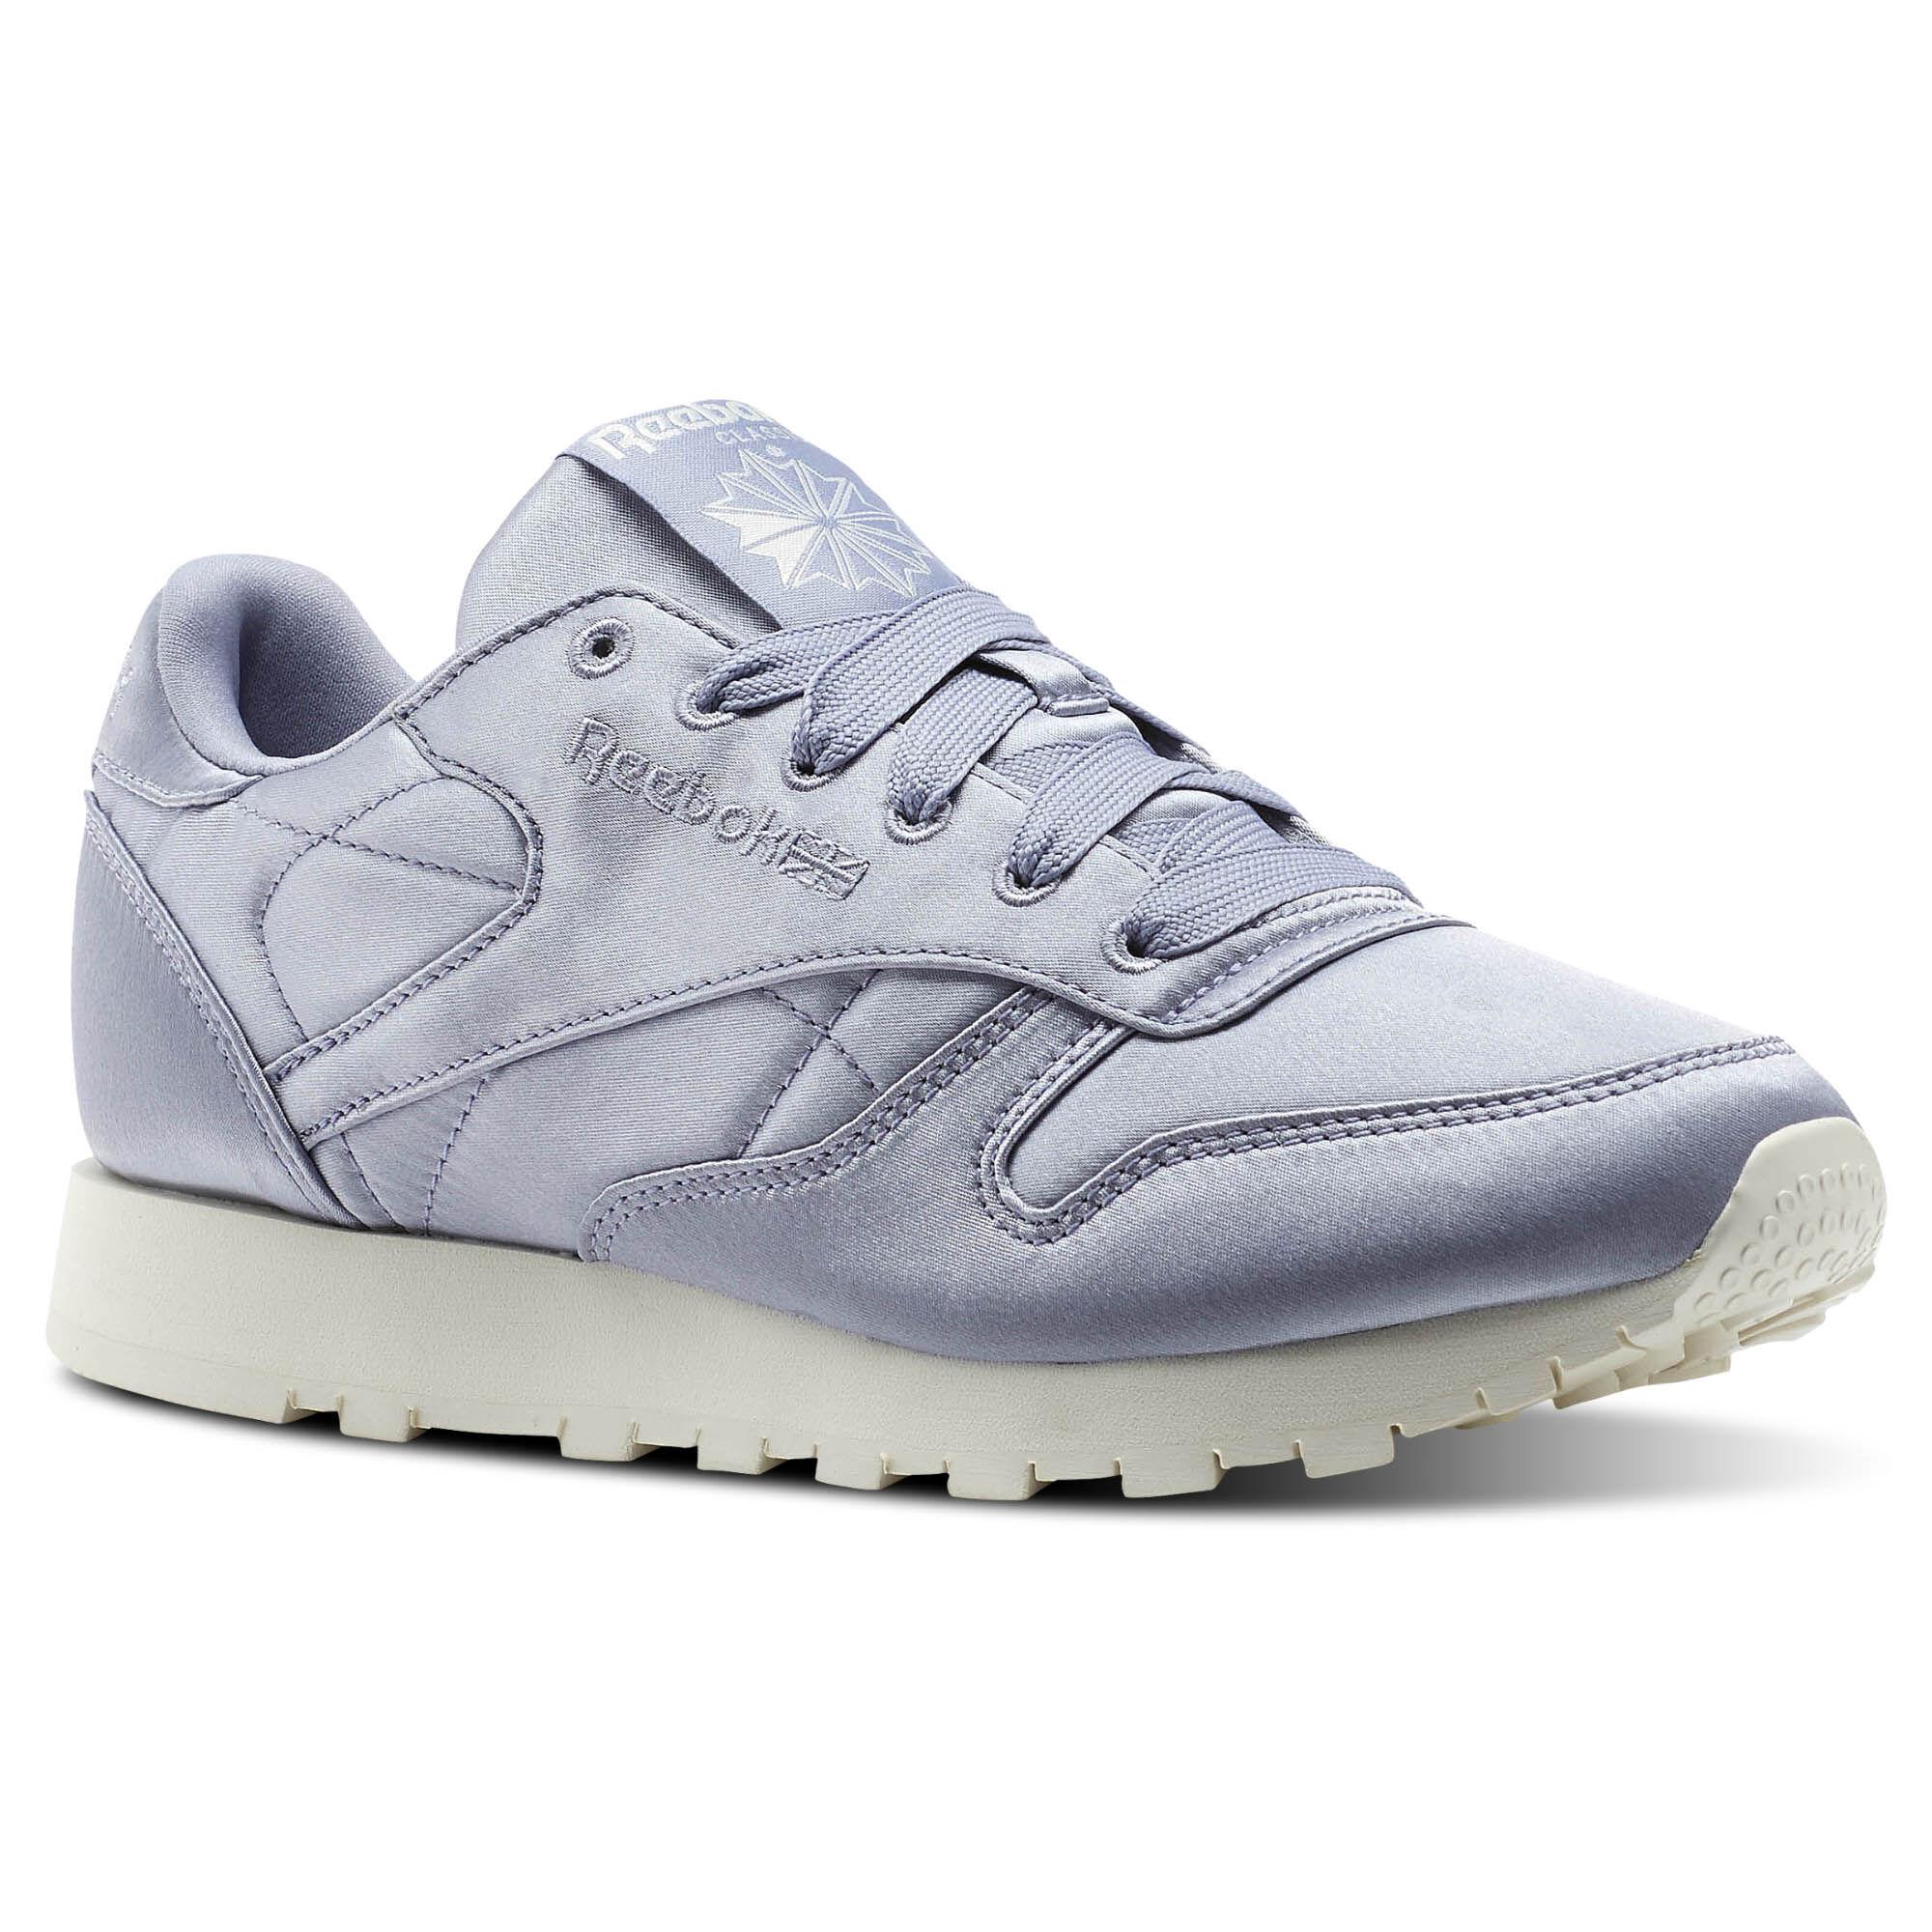 Damen Schuhe sneakers Reebok Classic Leather Satin CM9800 - ROSA XBuEyR